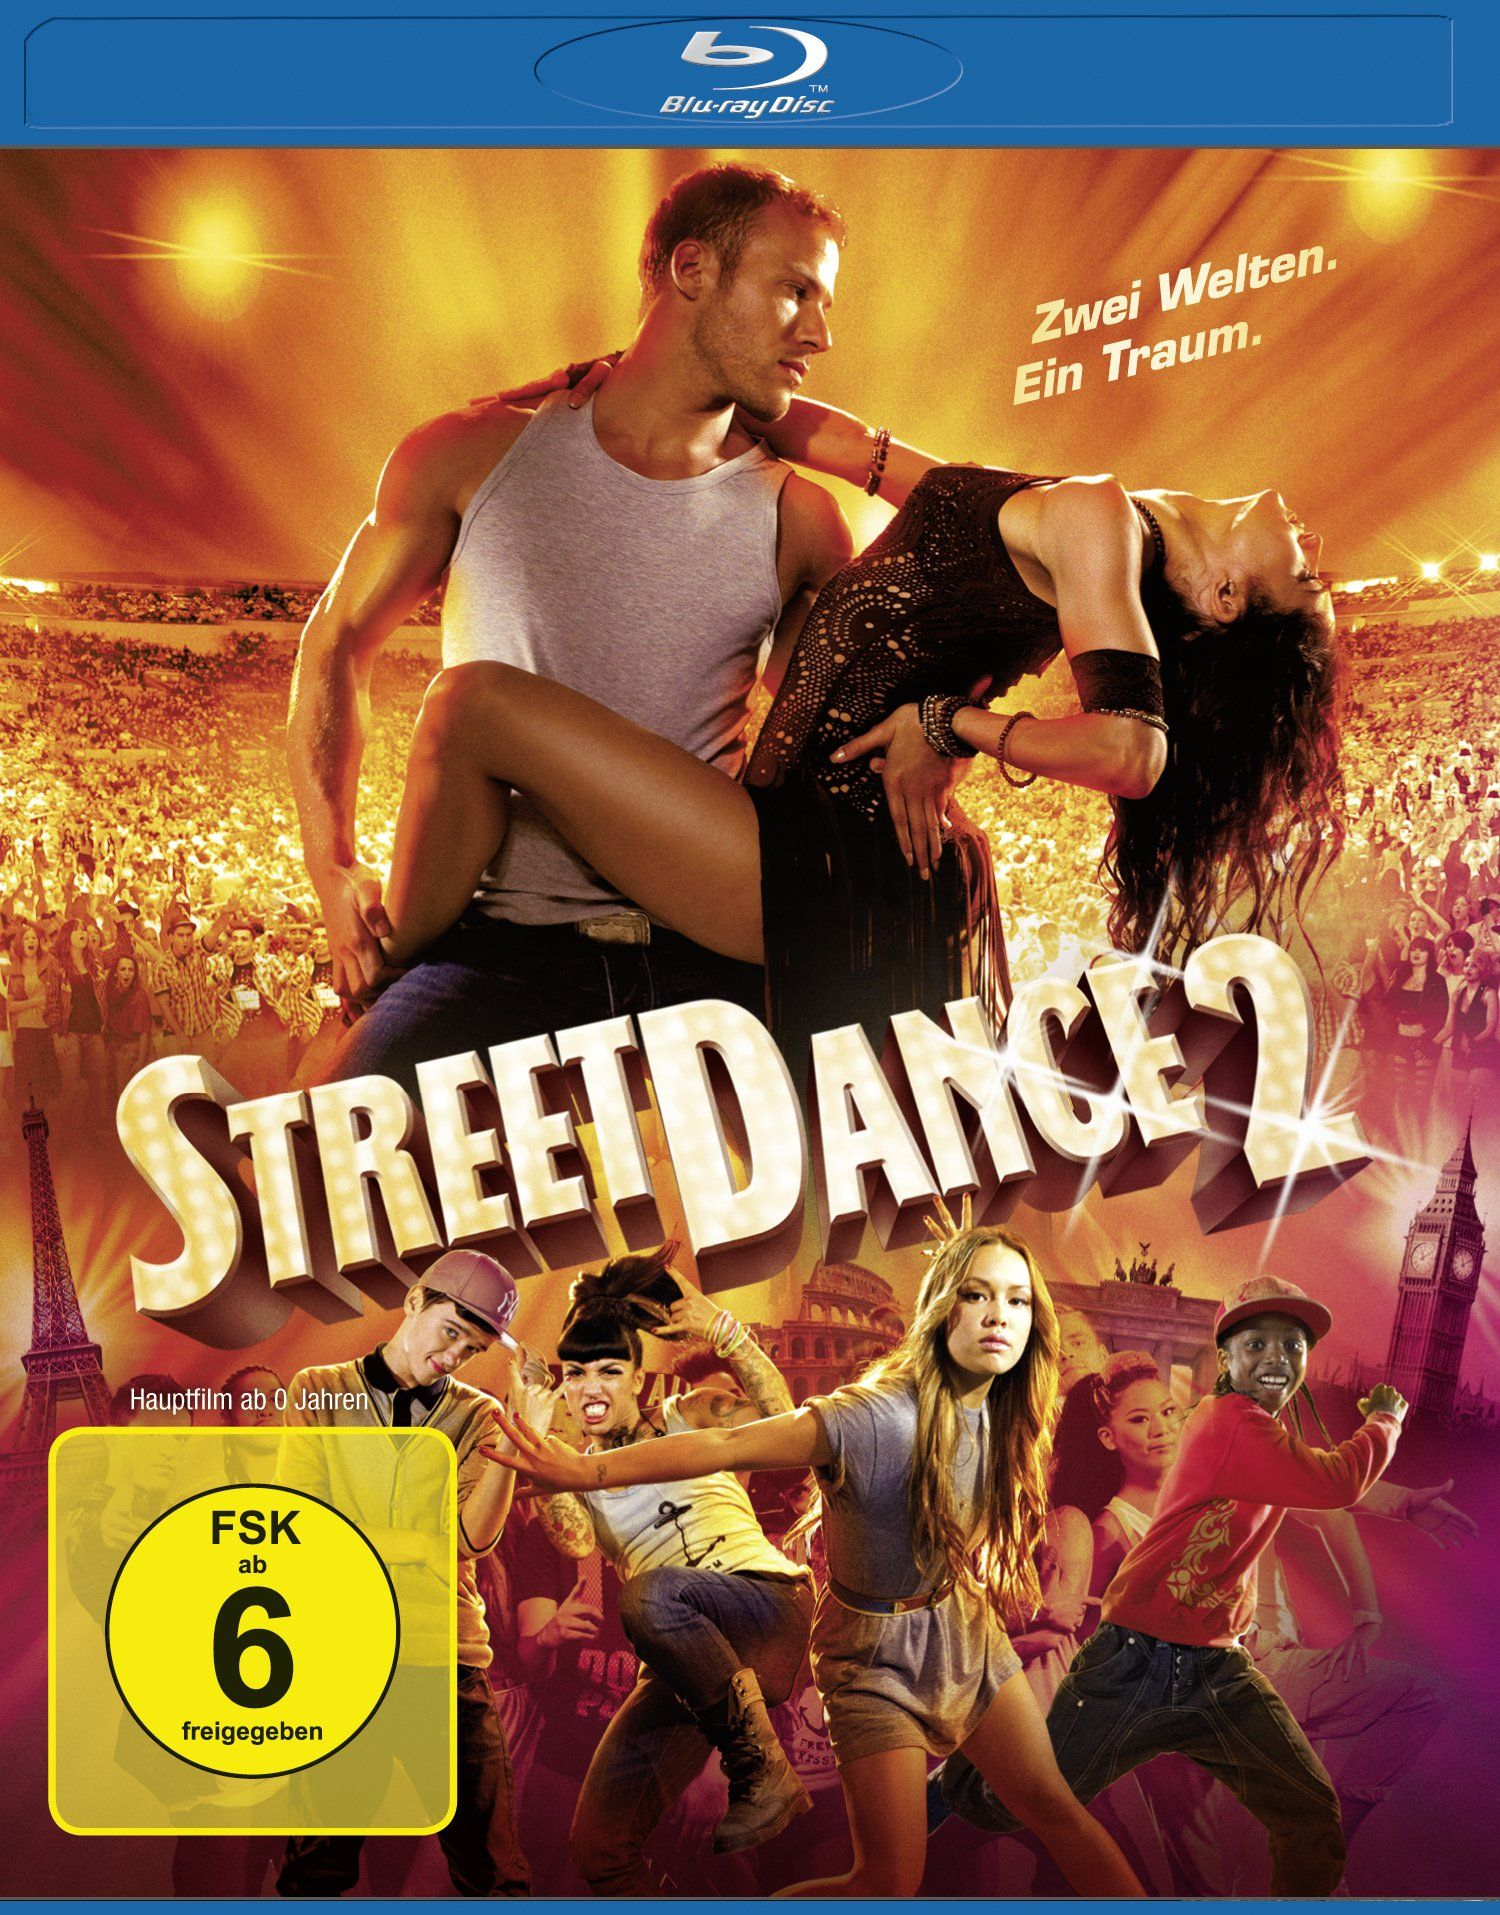 Streetdance 2 Alemania Blu Ray Ad Alemania Streetdance Ray Blu Peliculas Musicales Peliculas Step Up Peliculas Cine